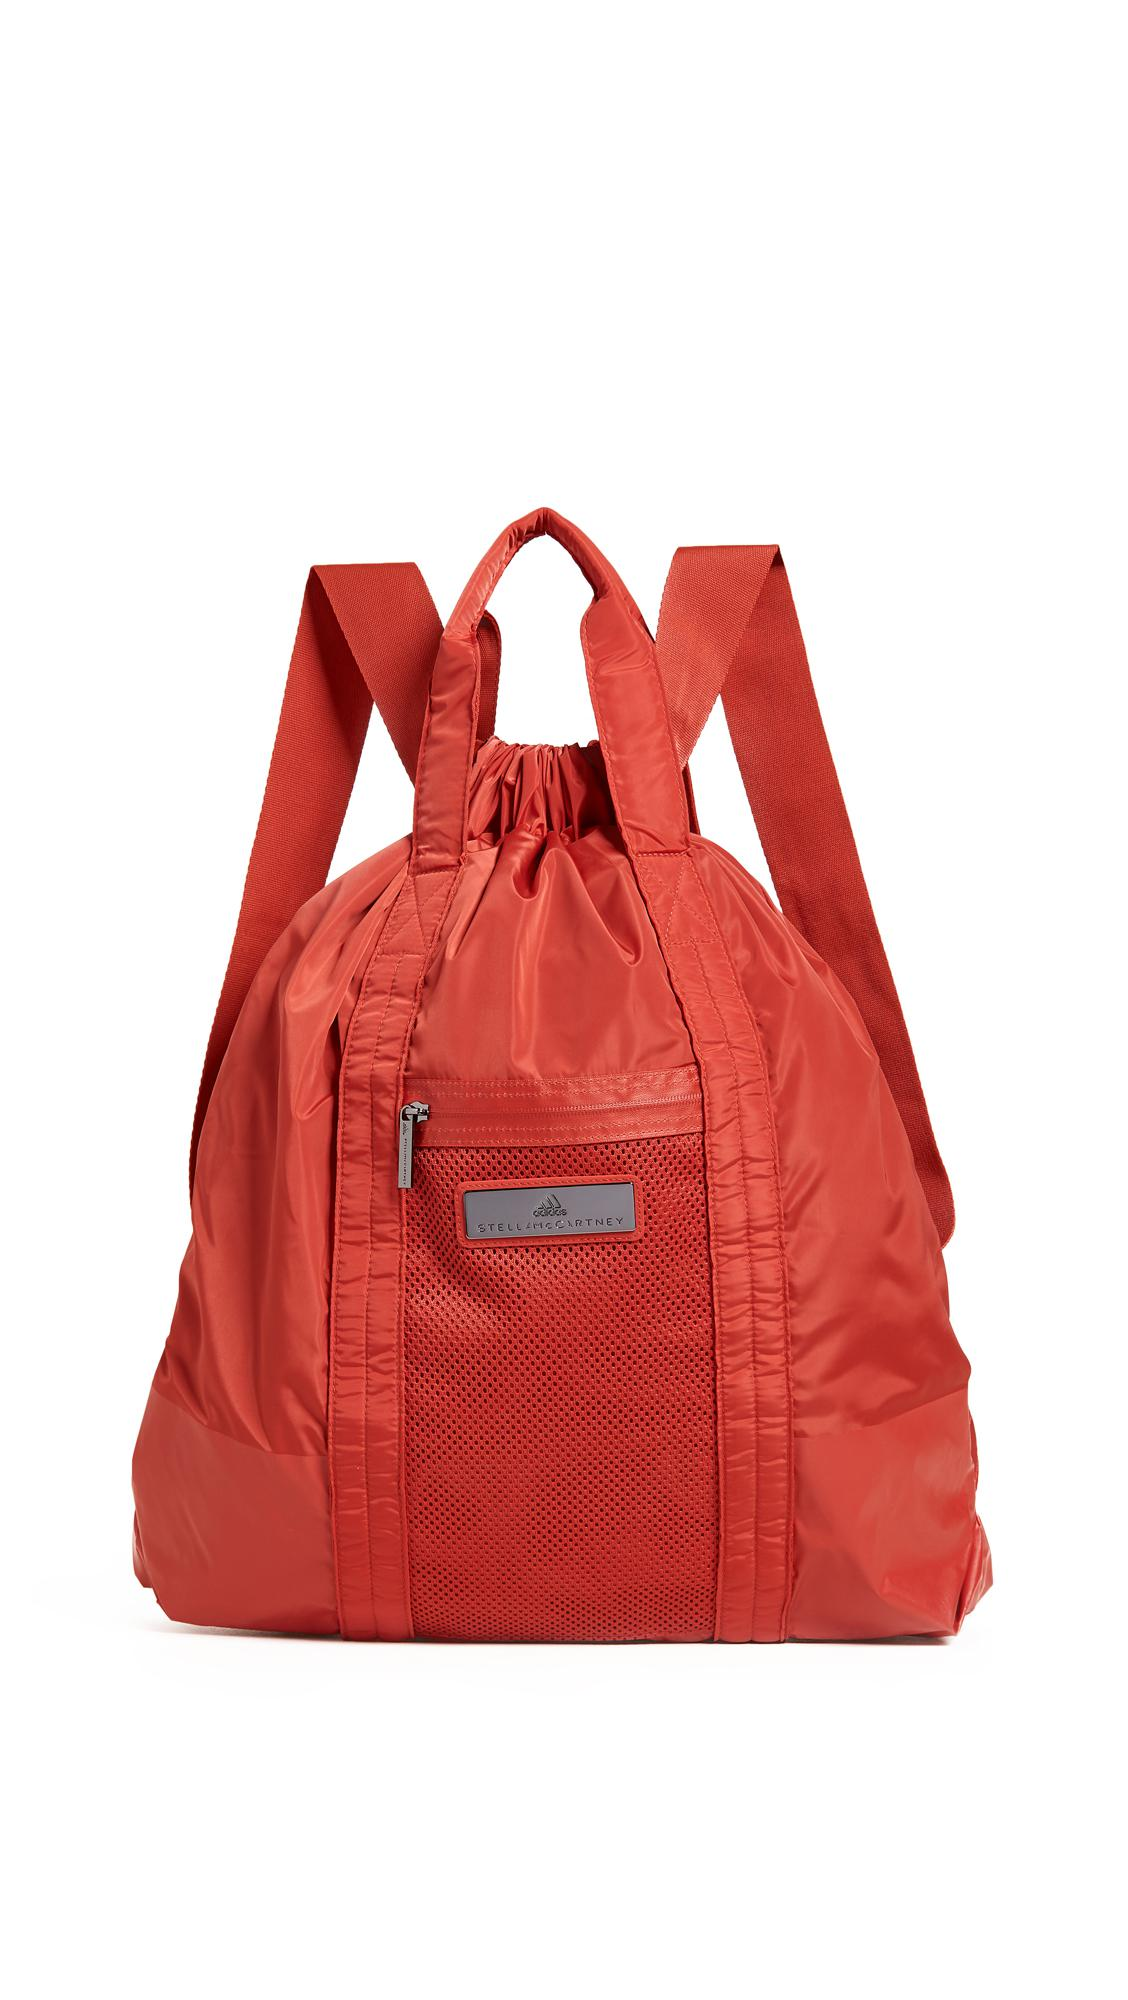 Lyst - adidas By Stella McCartney Gym Sack Backpack in Red 63914874f6